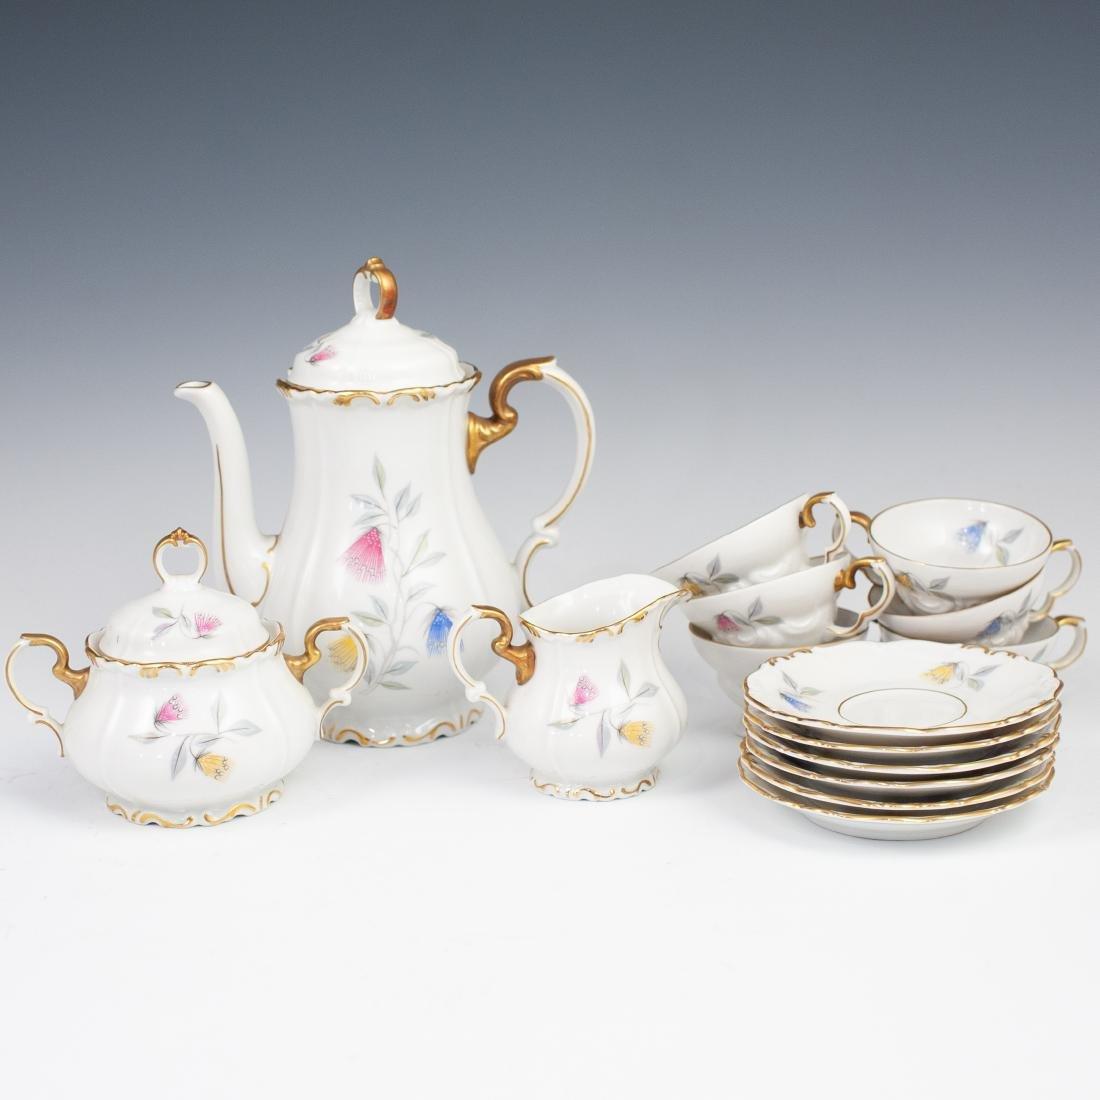 Edelstein Bavaria Porcelain Tea Set